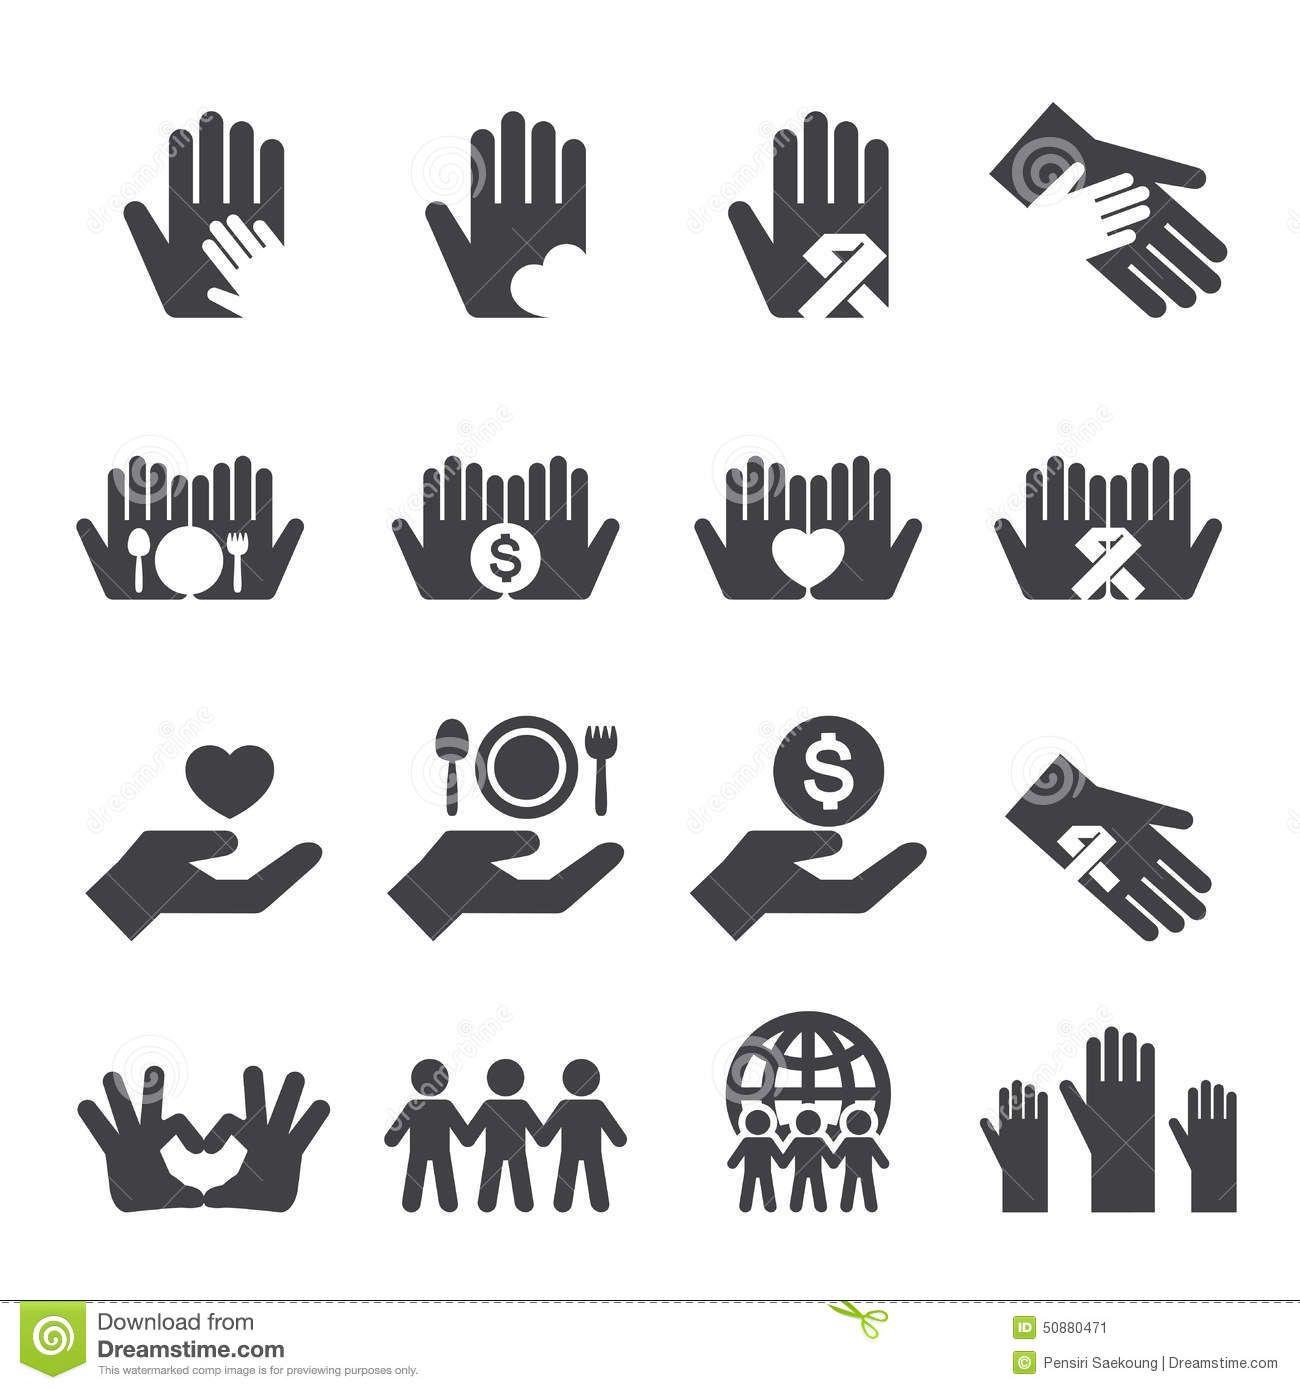 Charity symbols google search psa pinterest symbols charity symbols google search biocorpaavc